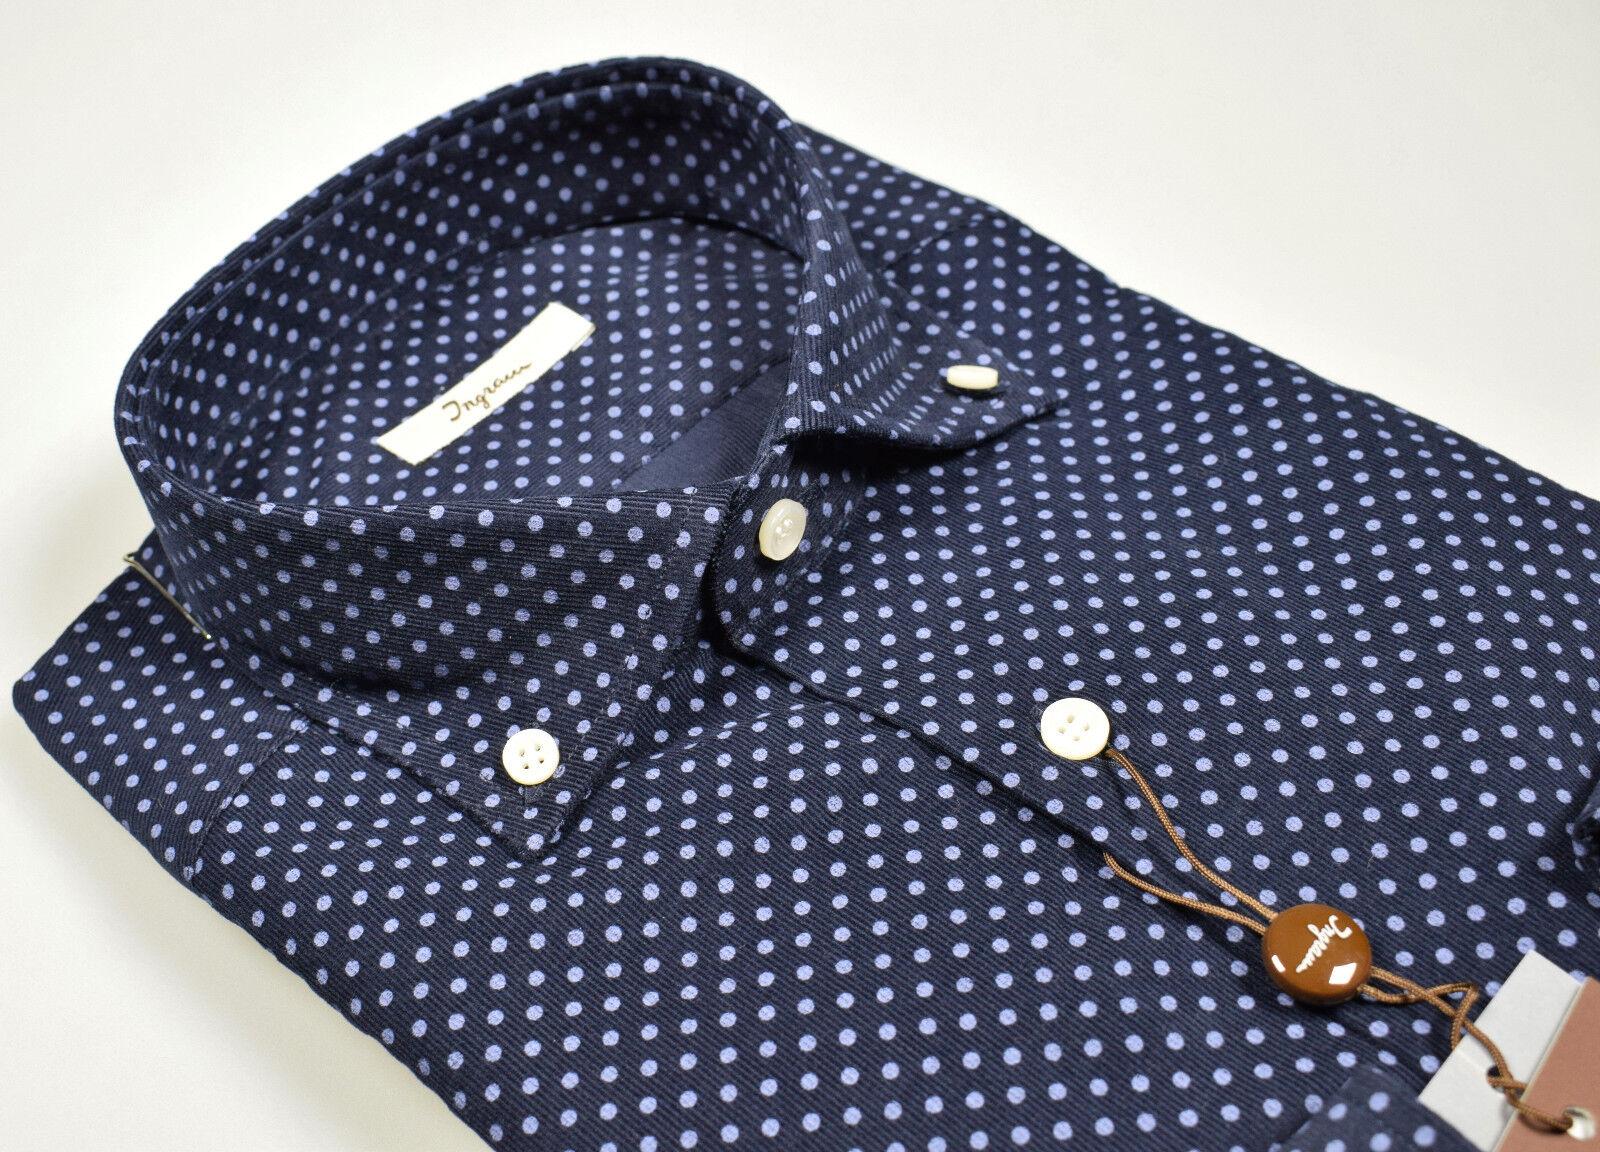 Camicia in Velluto stampato a Pois Ingram Button Down Regular Fit Inverno 18/19